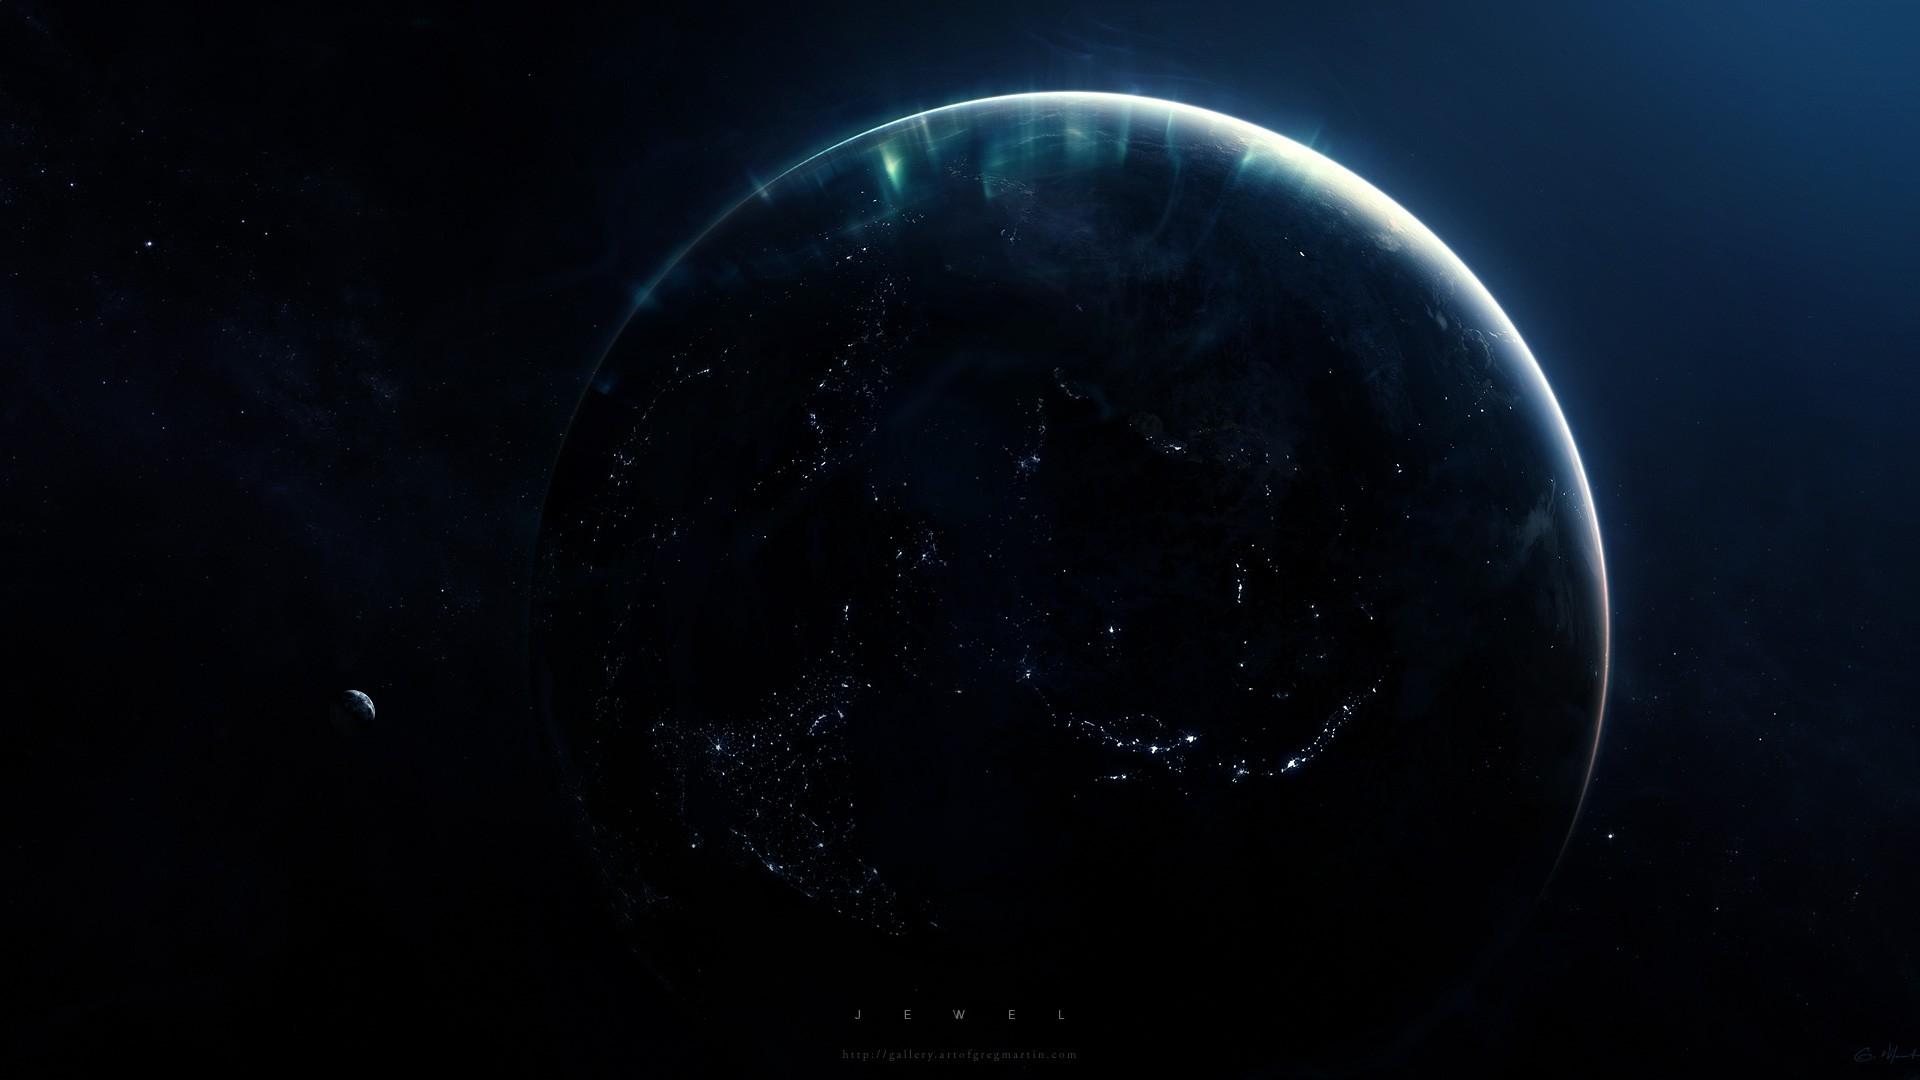 Wallpaper Planet Sky Artwork Earth Space Art